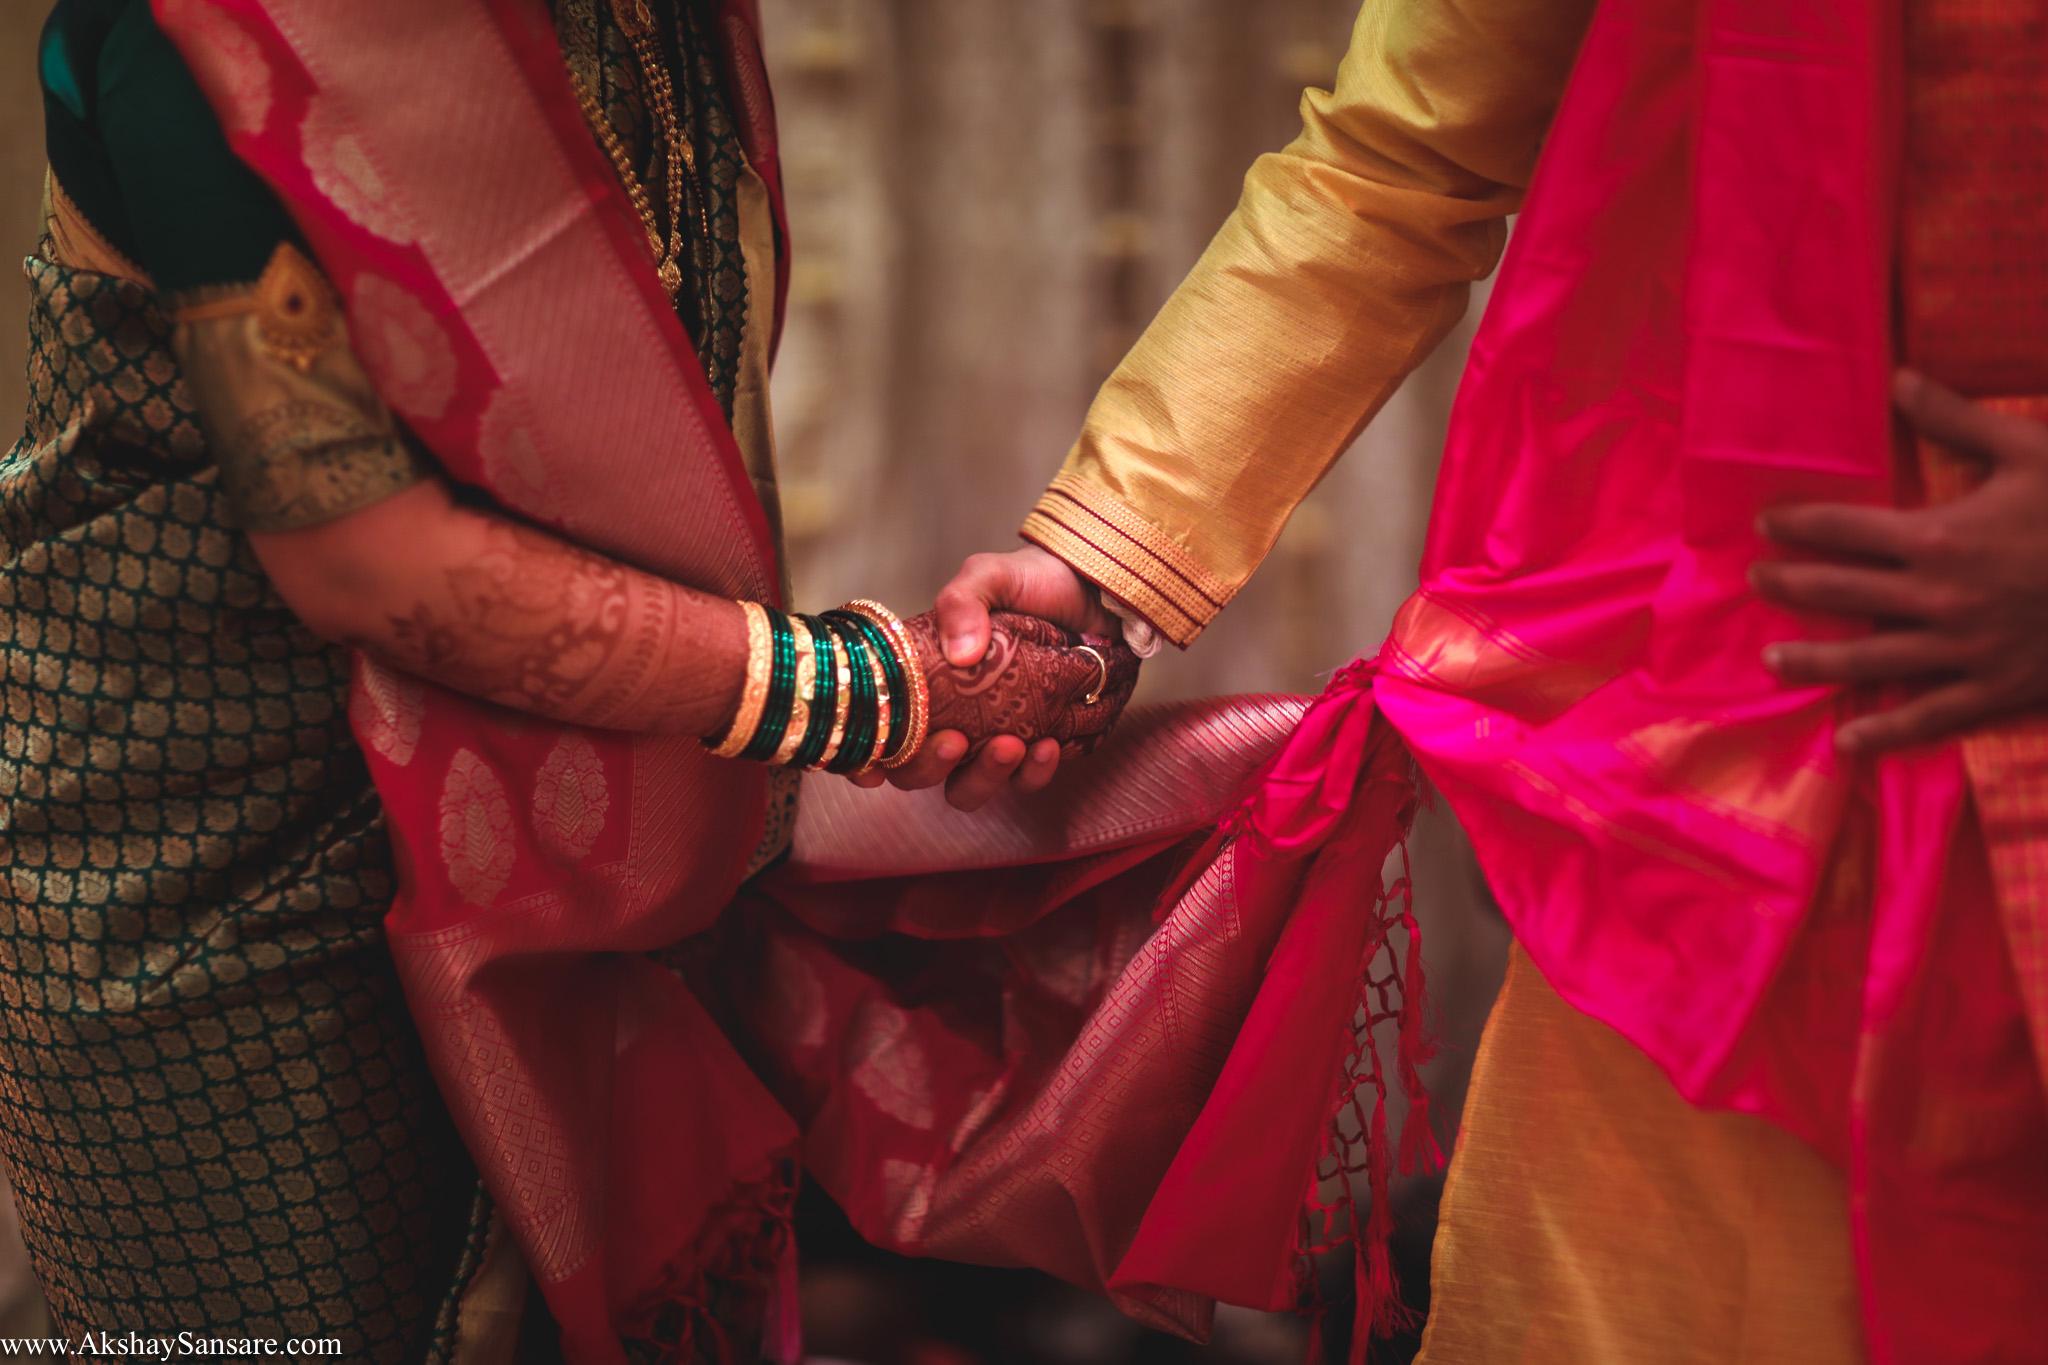 Akshay Sansare Best Candid Photographers in Mumbai (15).jpg